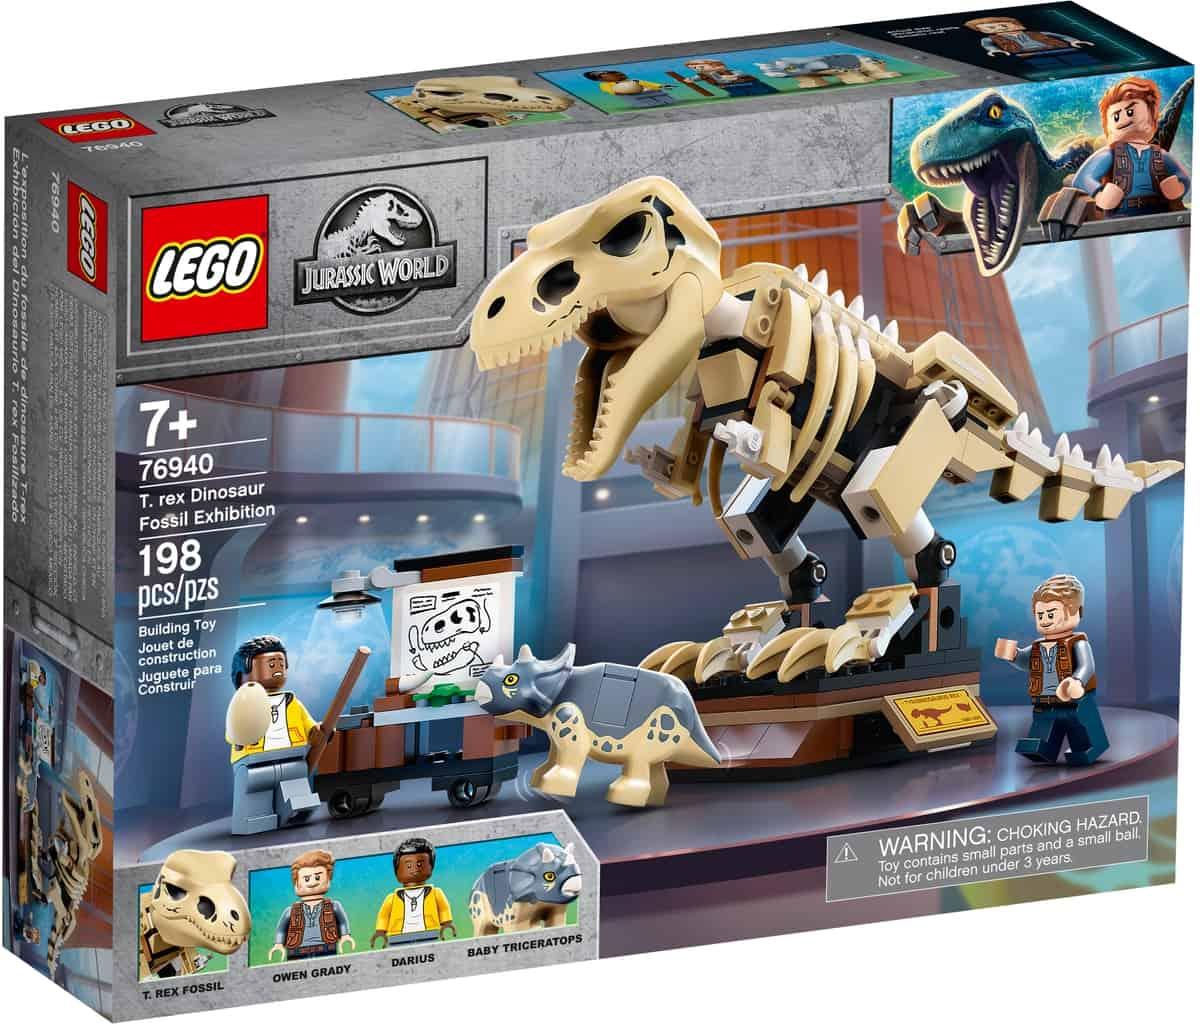 lego 76940 t rex dinosaur fossil